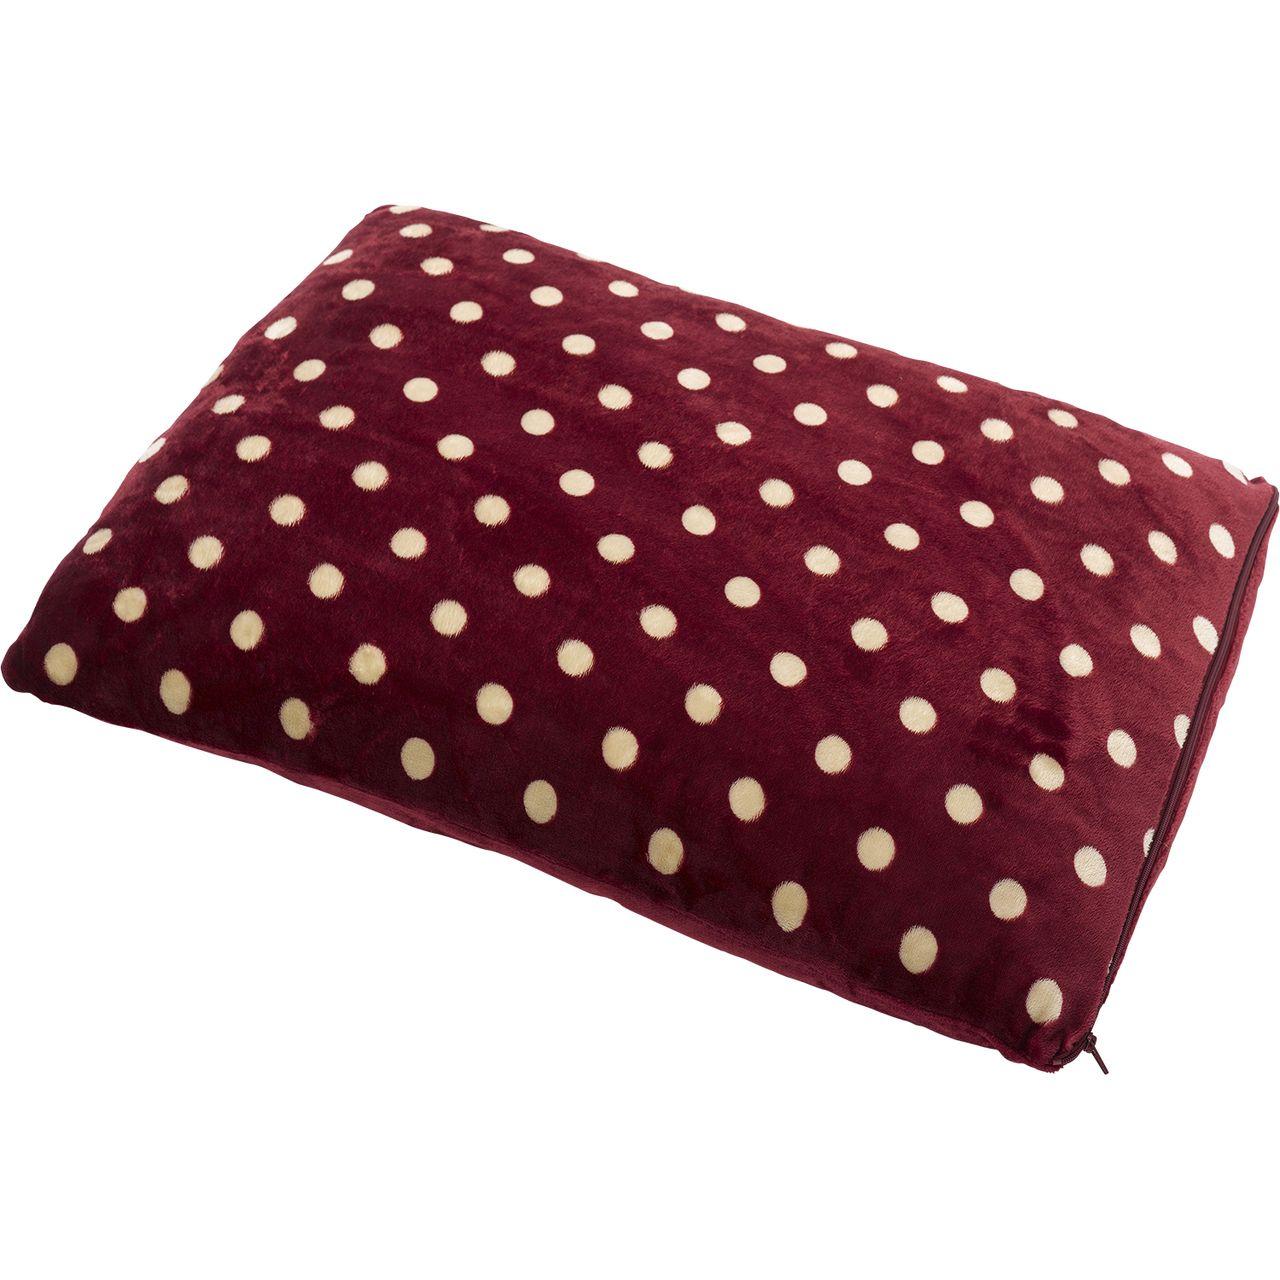 Petface Luxury Red & White Polka Dot Mattress (Medium